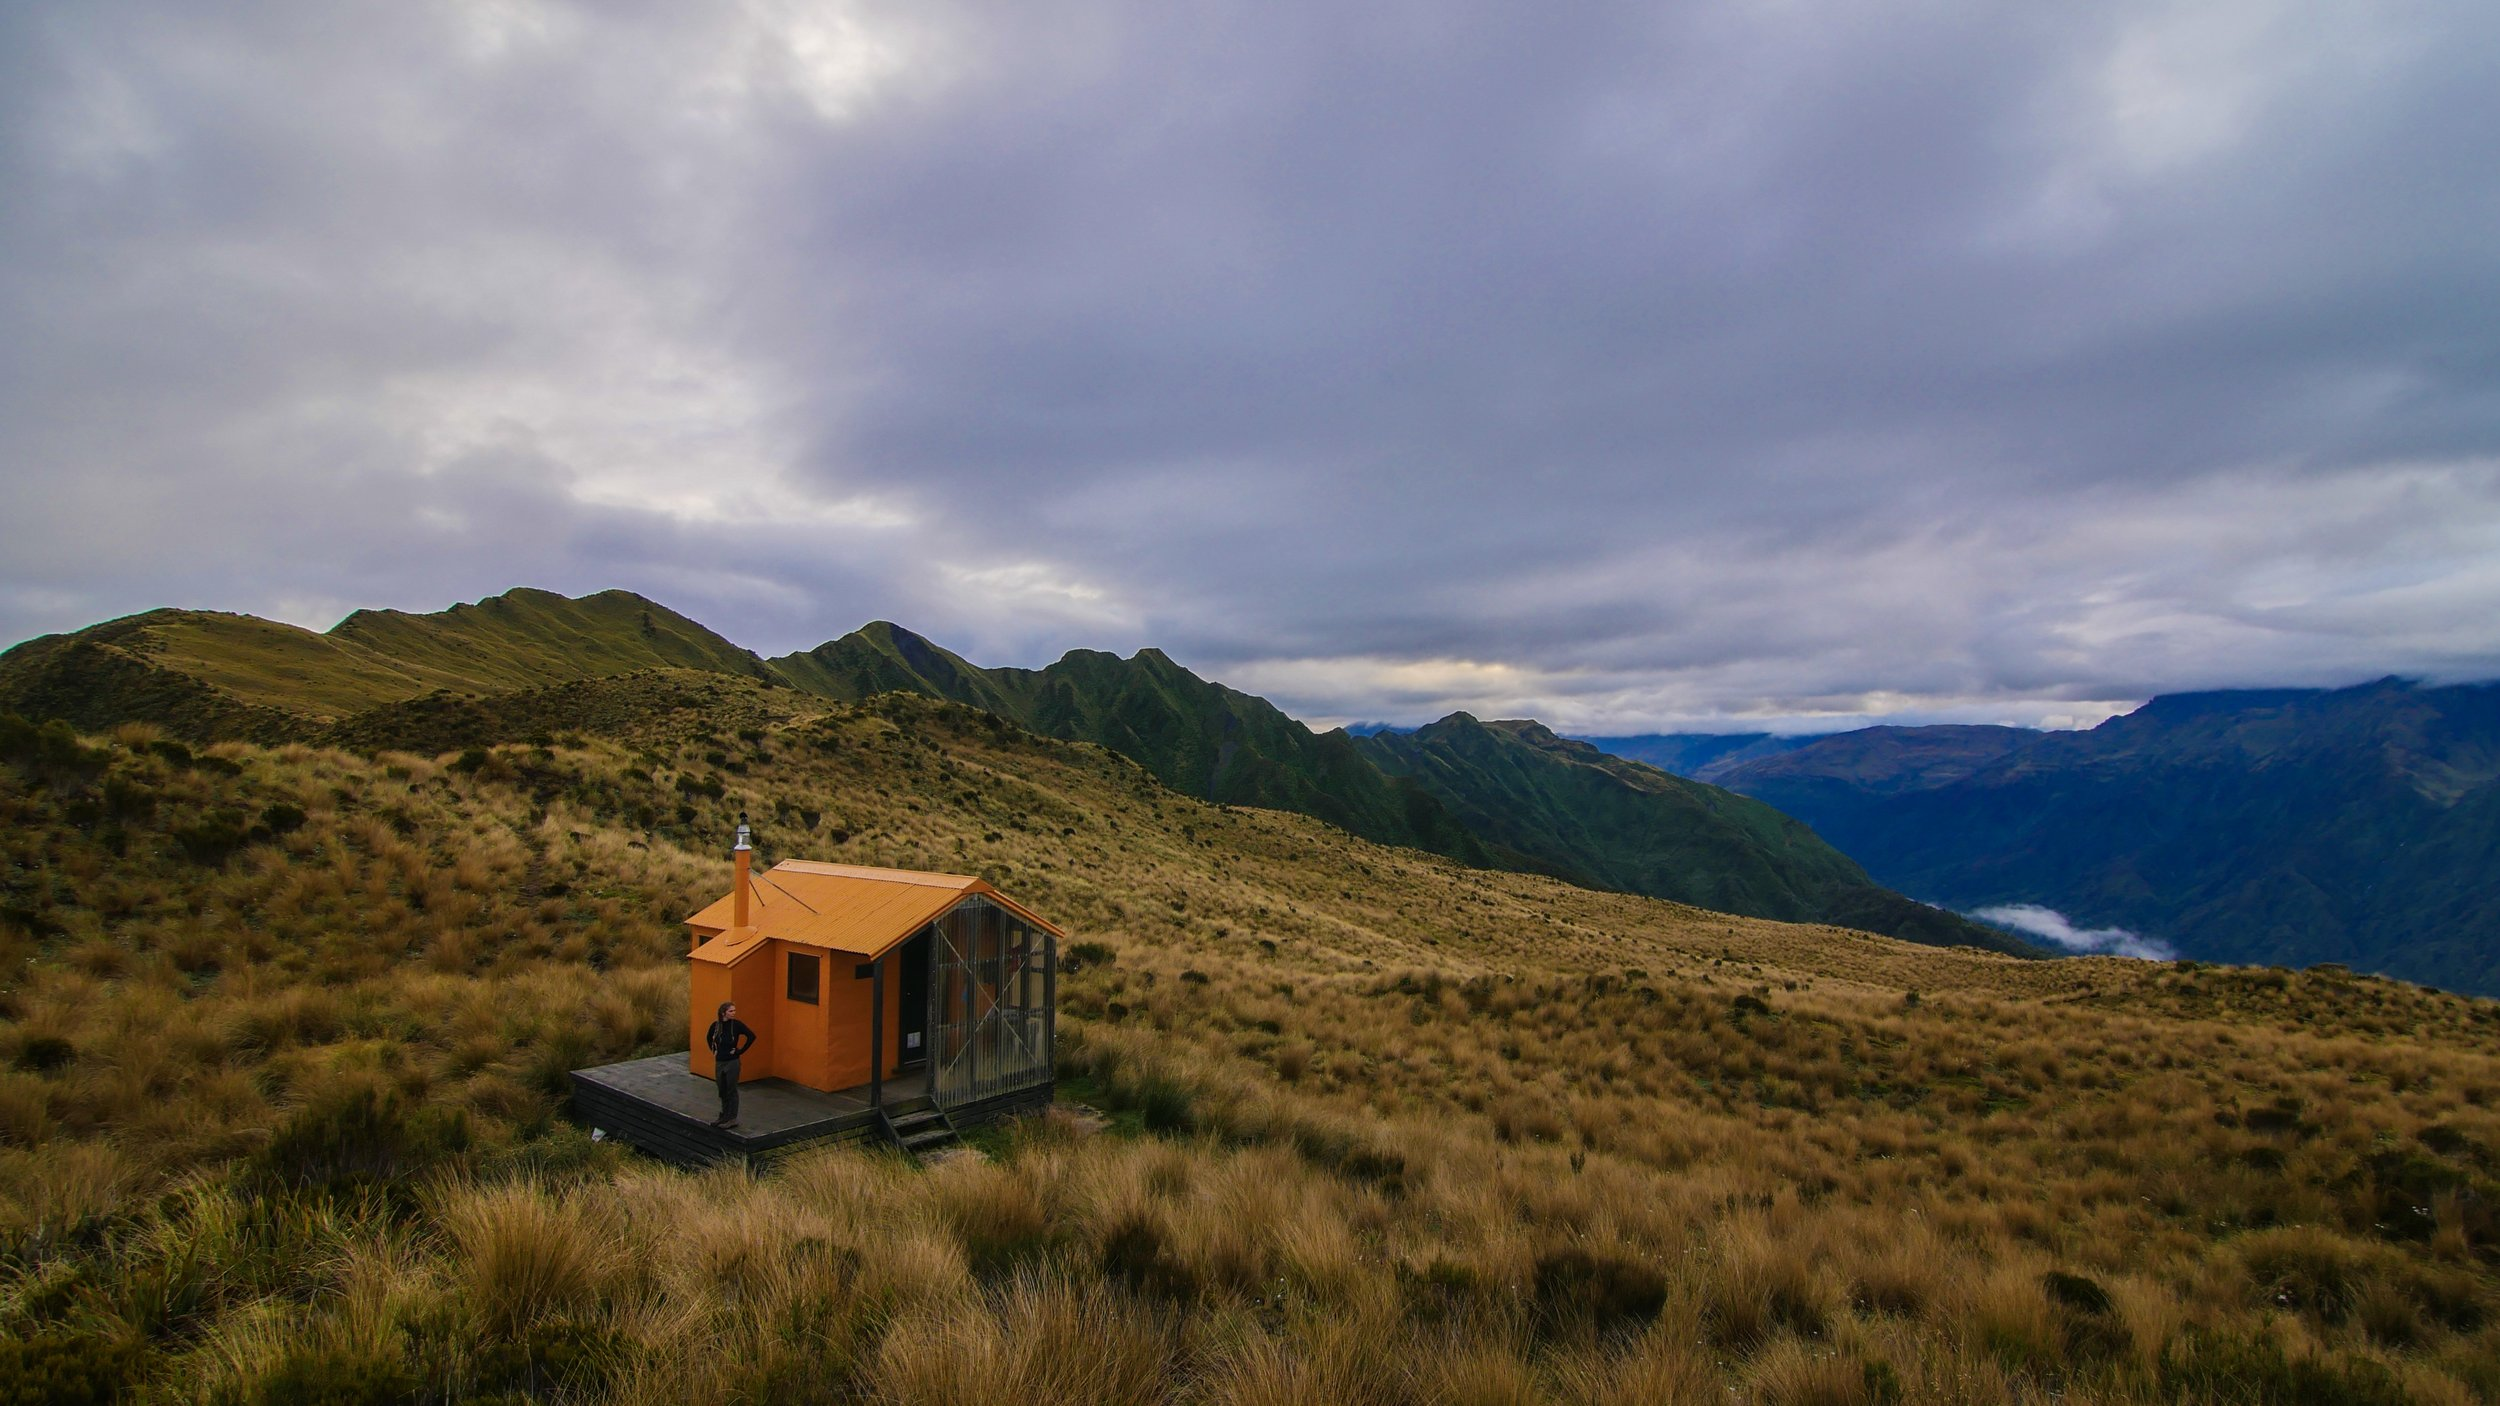 Mt Brown Hut New Zealand.JPG